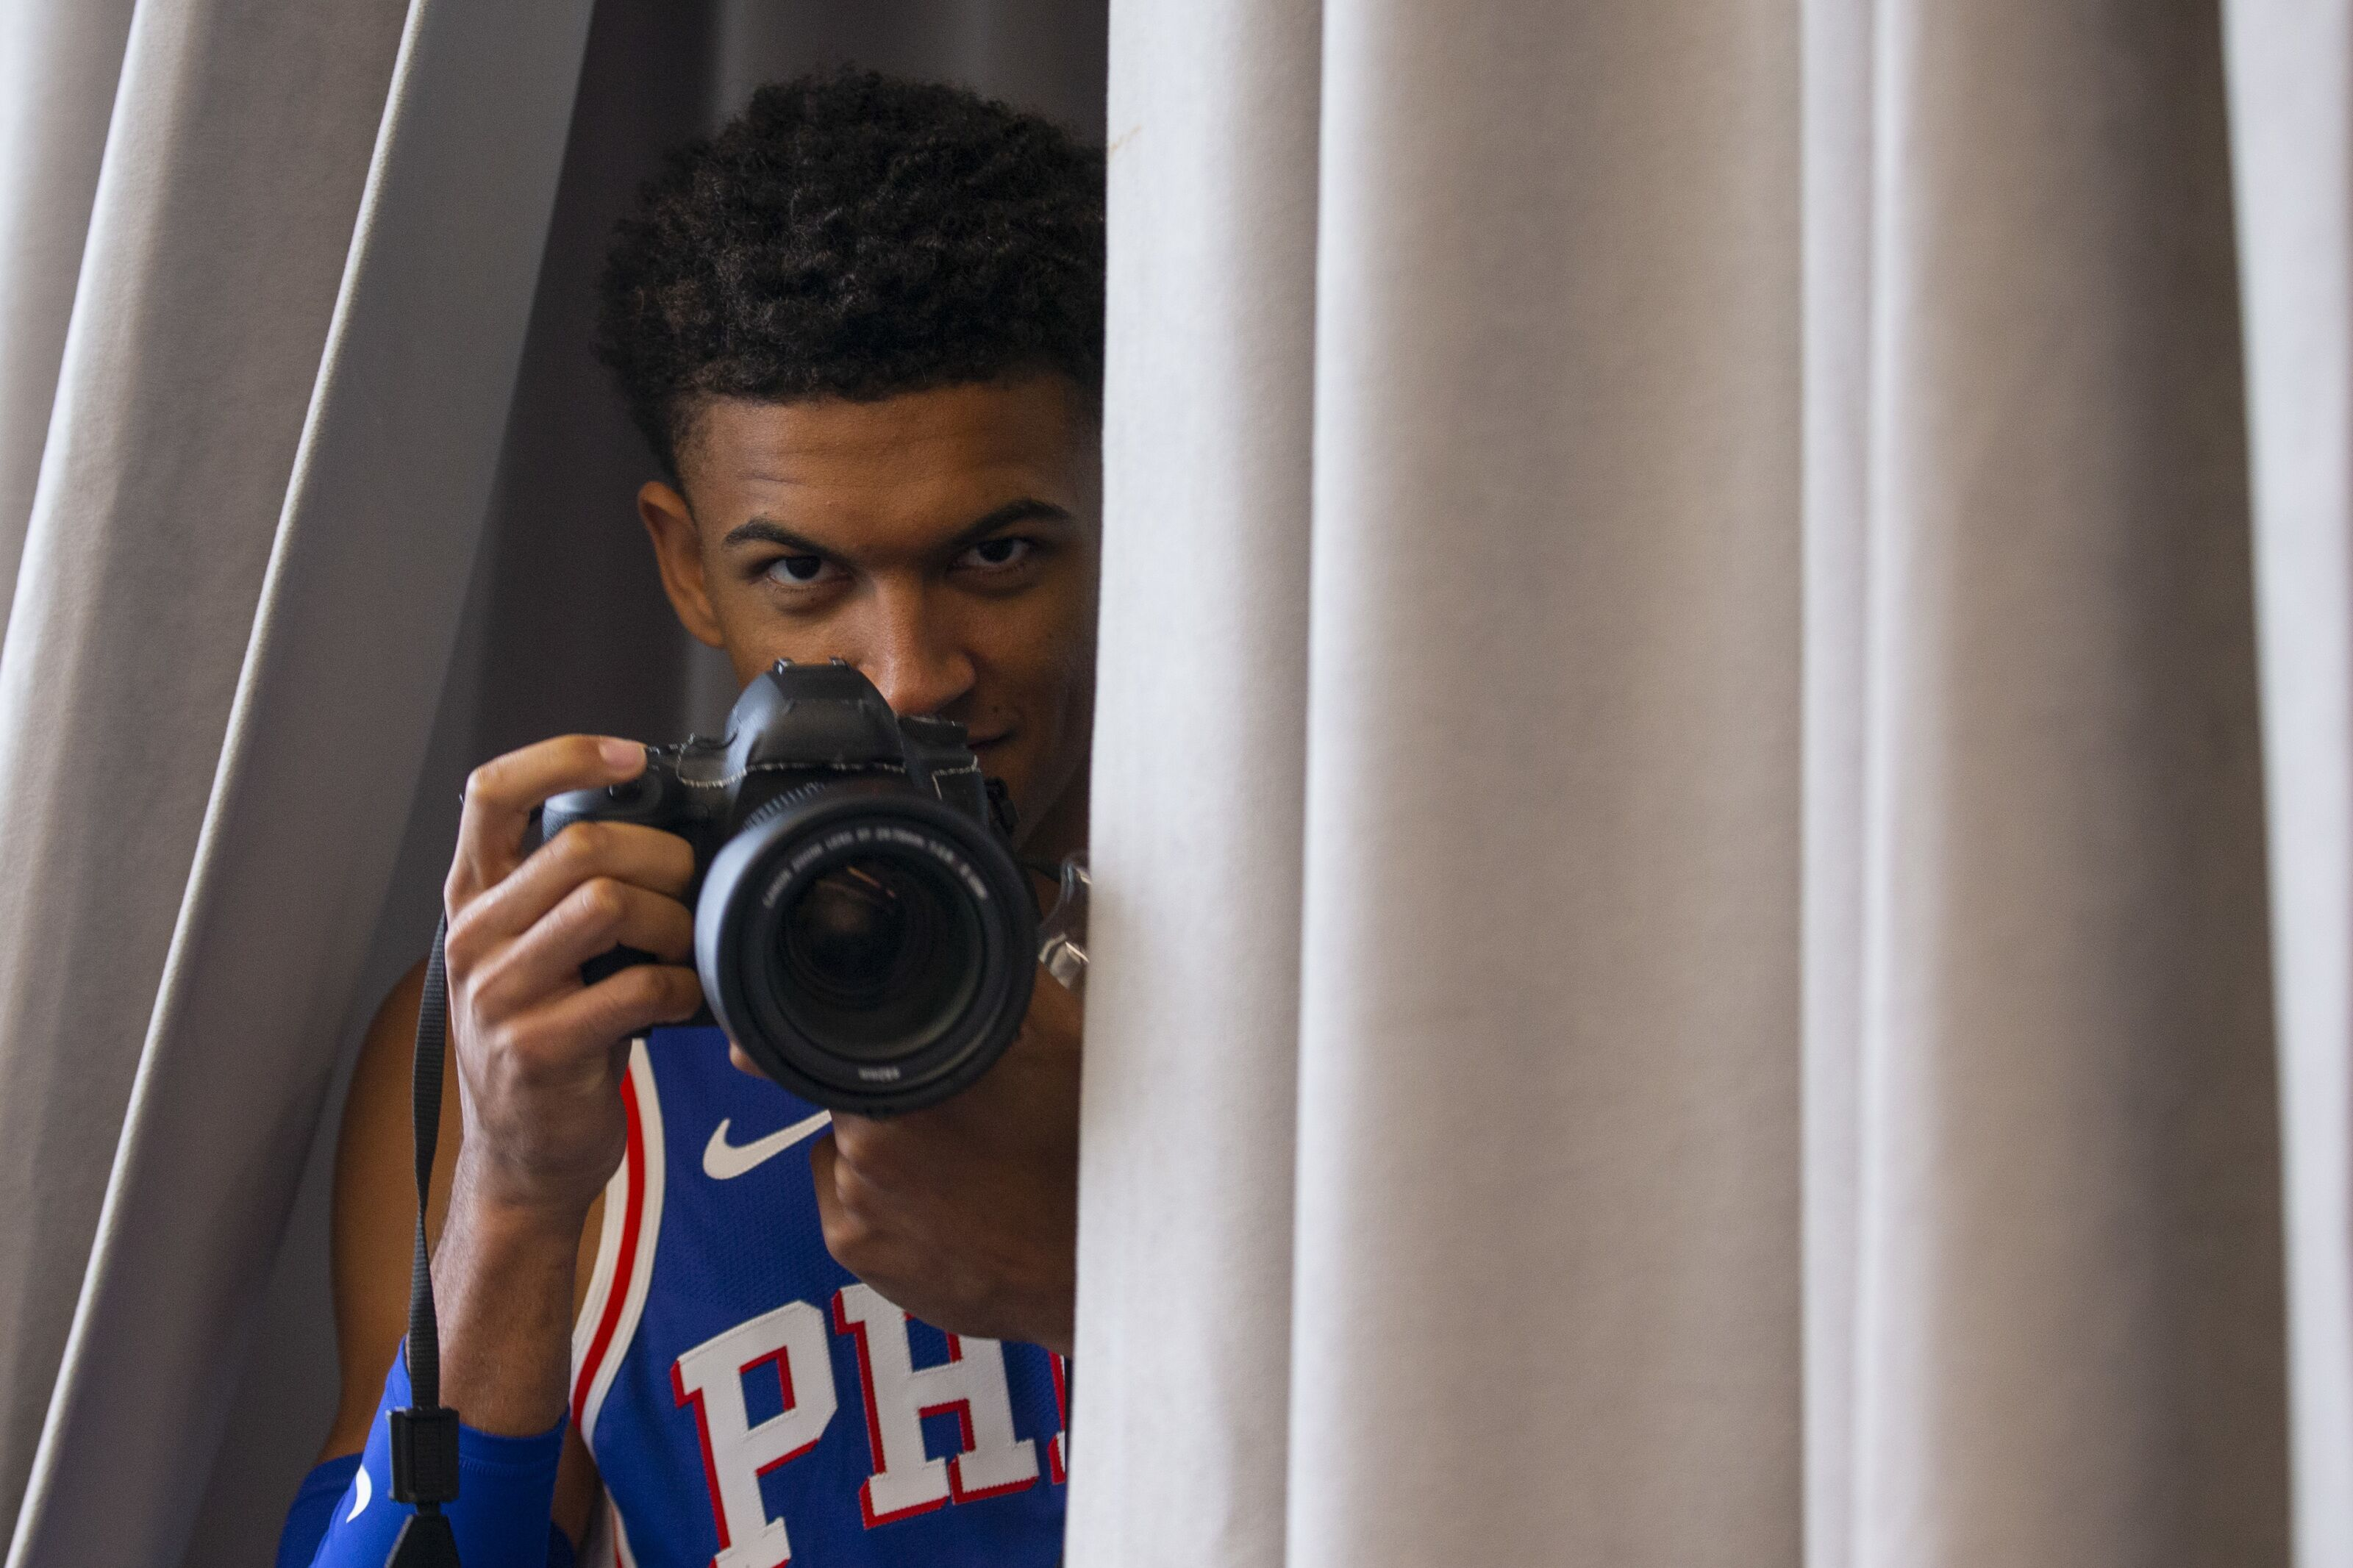 Philadelphia 76ers Crossover and City Edition uniforms